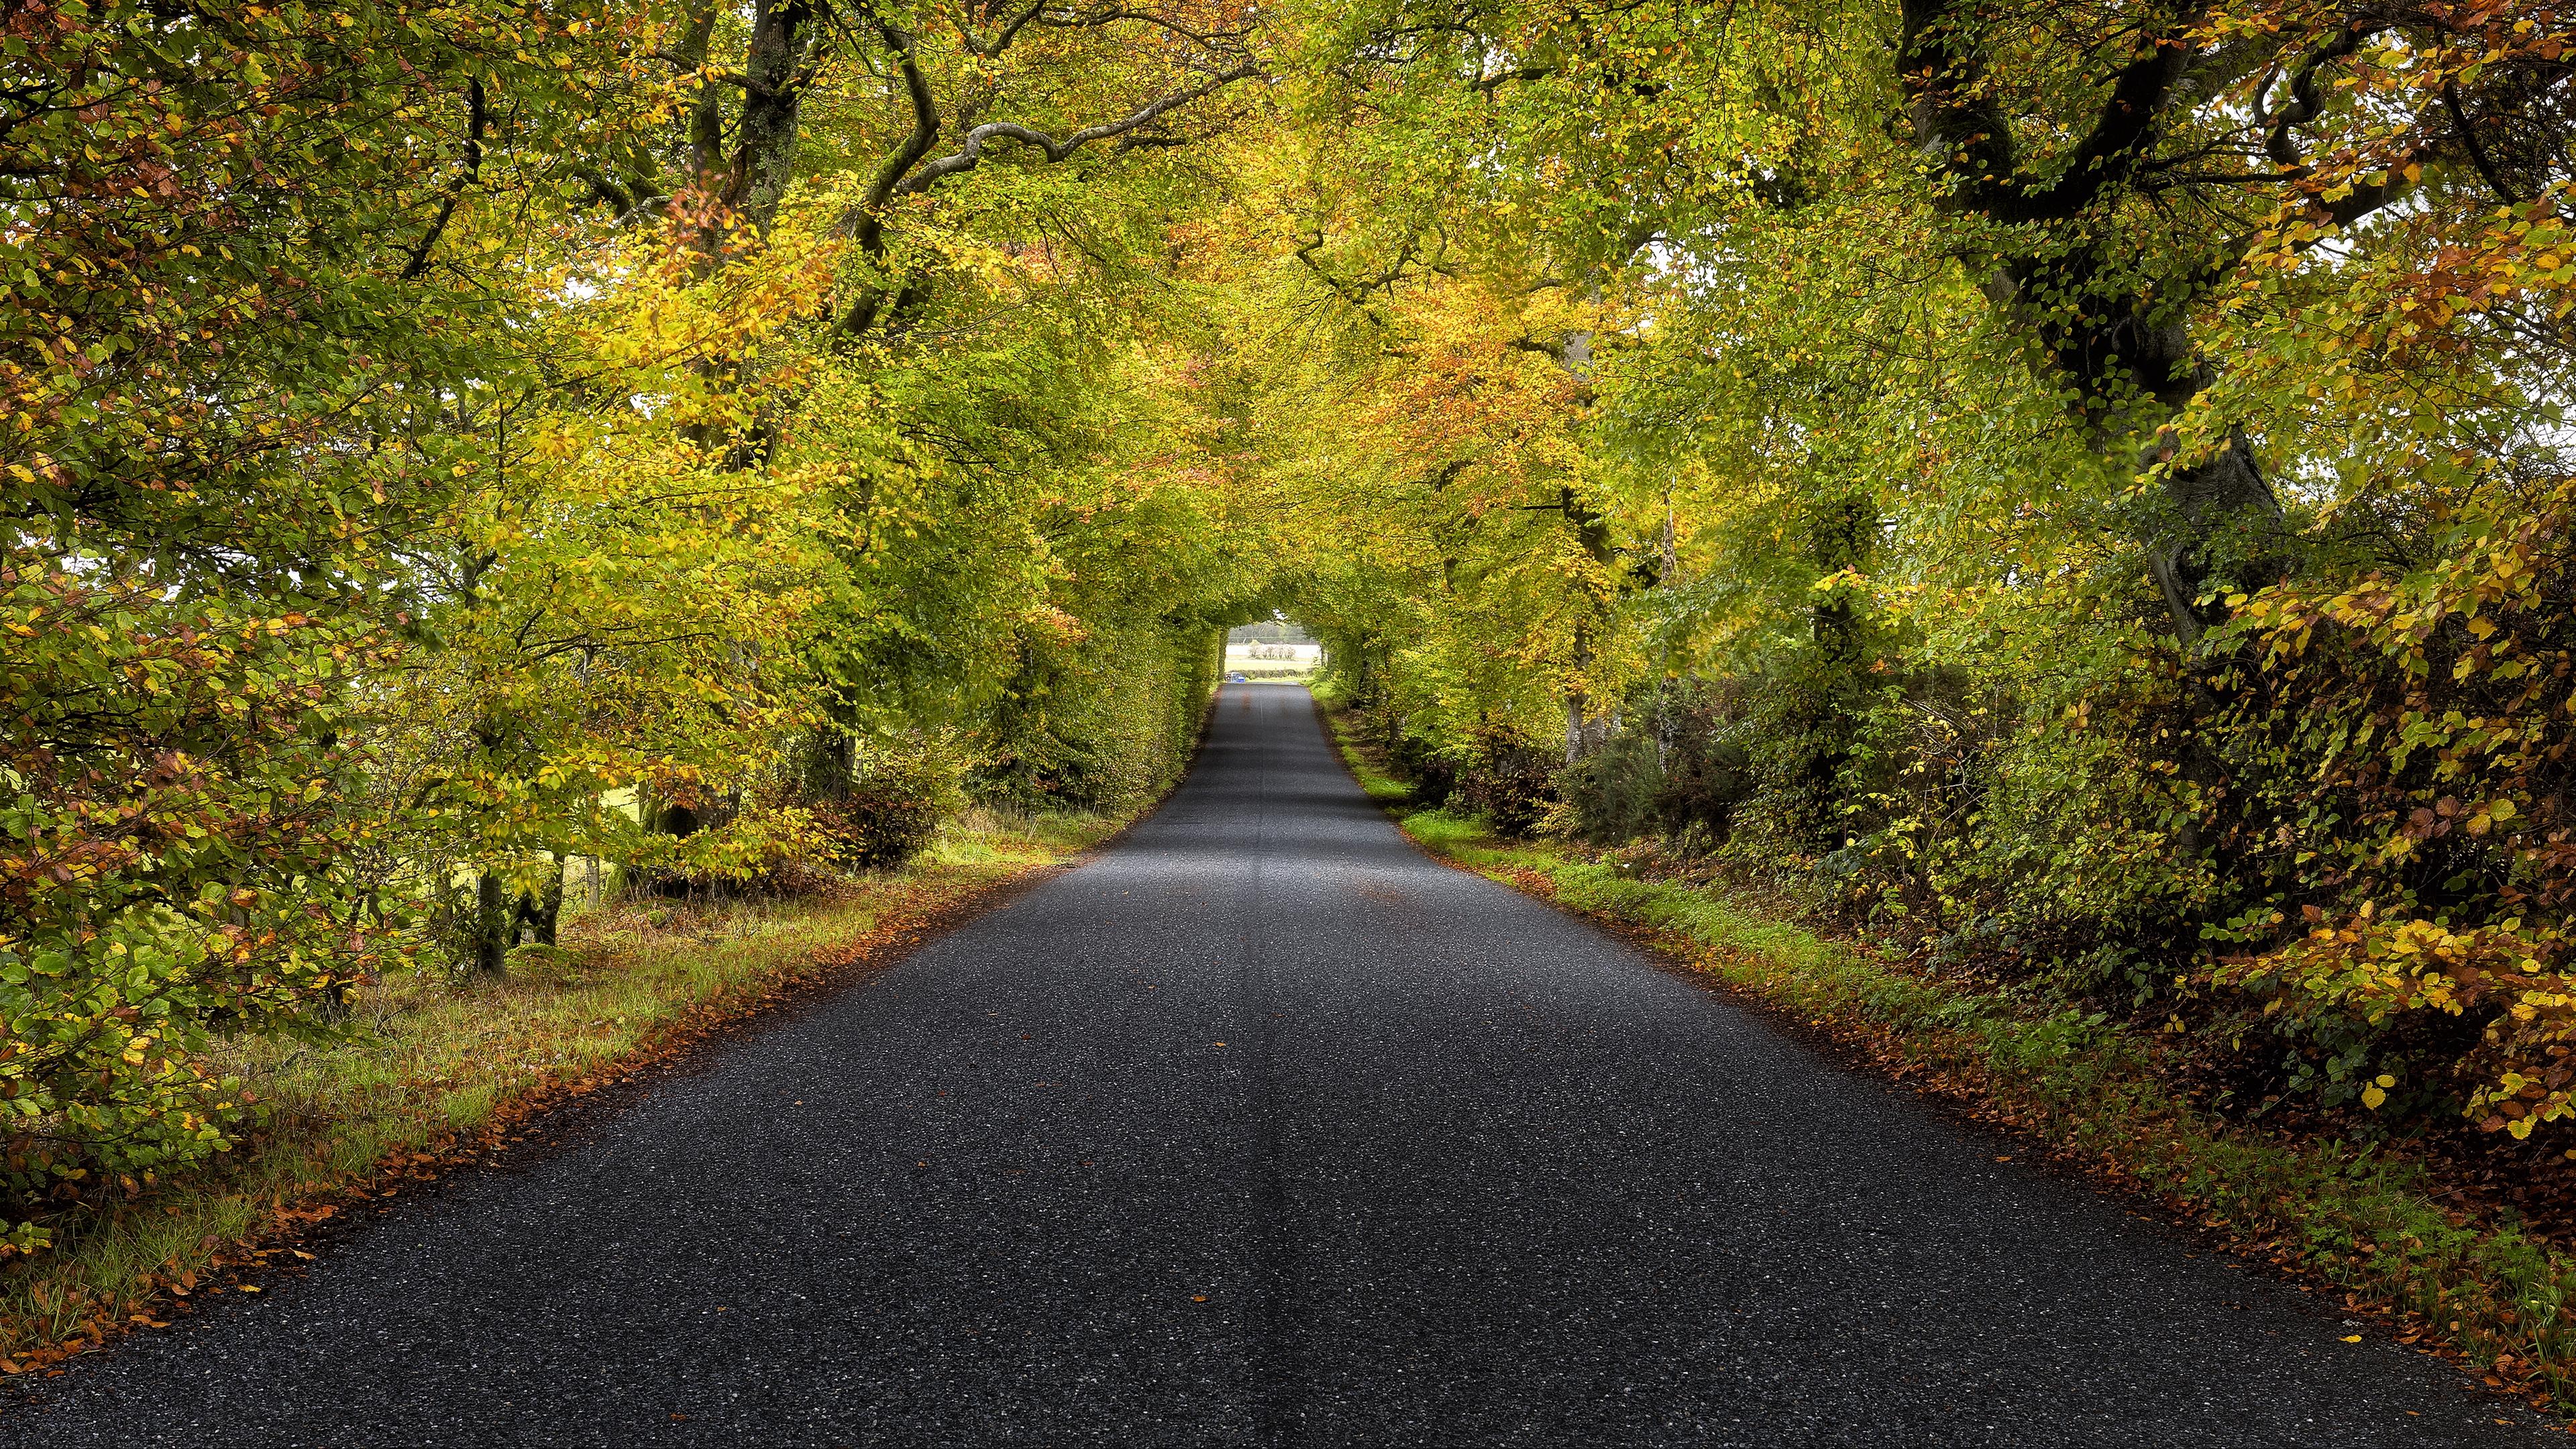 trees road autumn scotland 4k 1541115254 - trees, road, autumn, scotland 4k - Trees, Road, Autumn